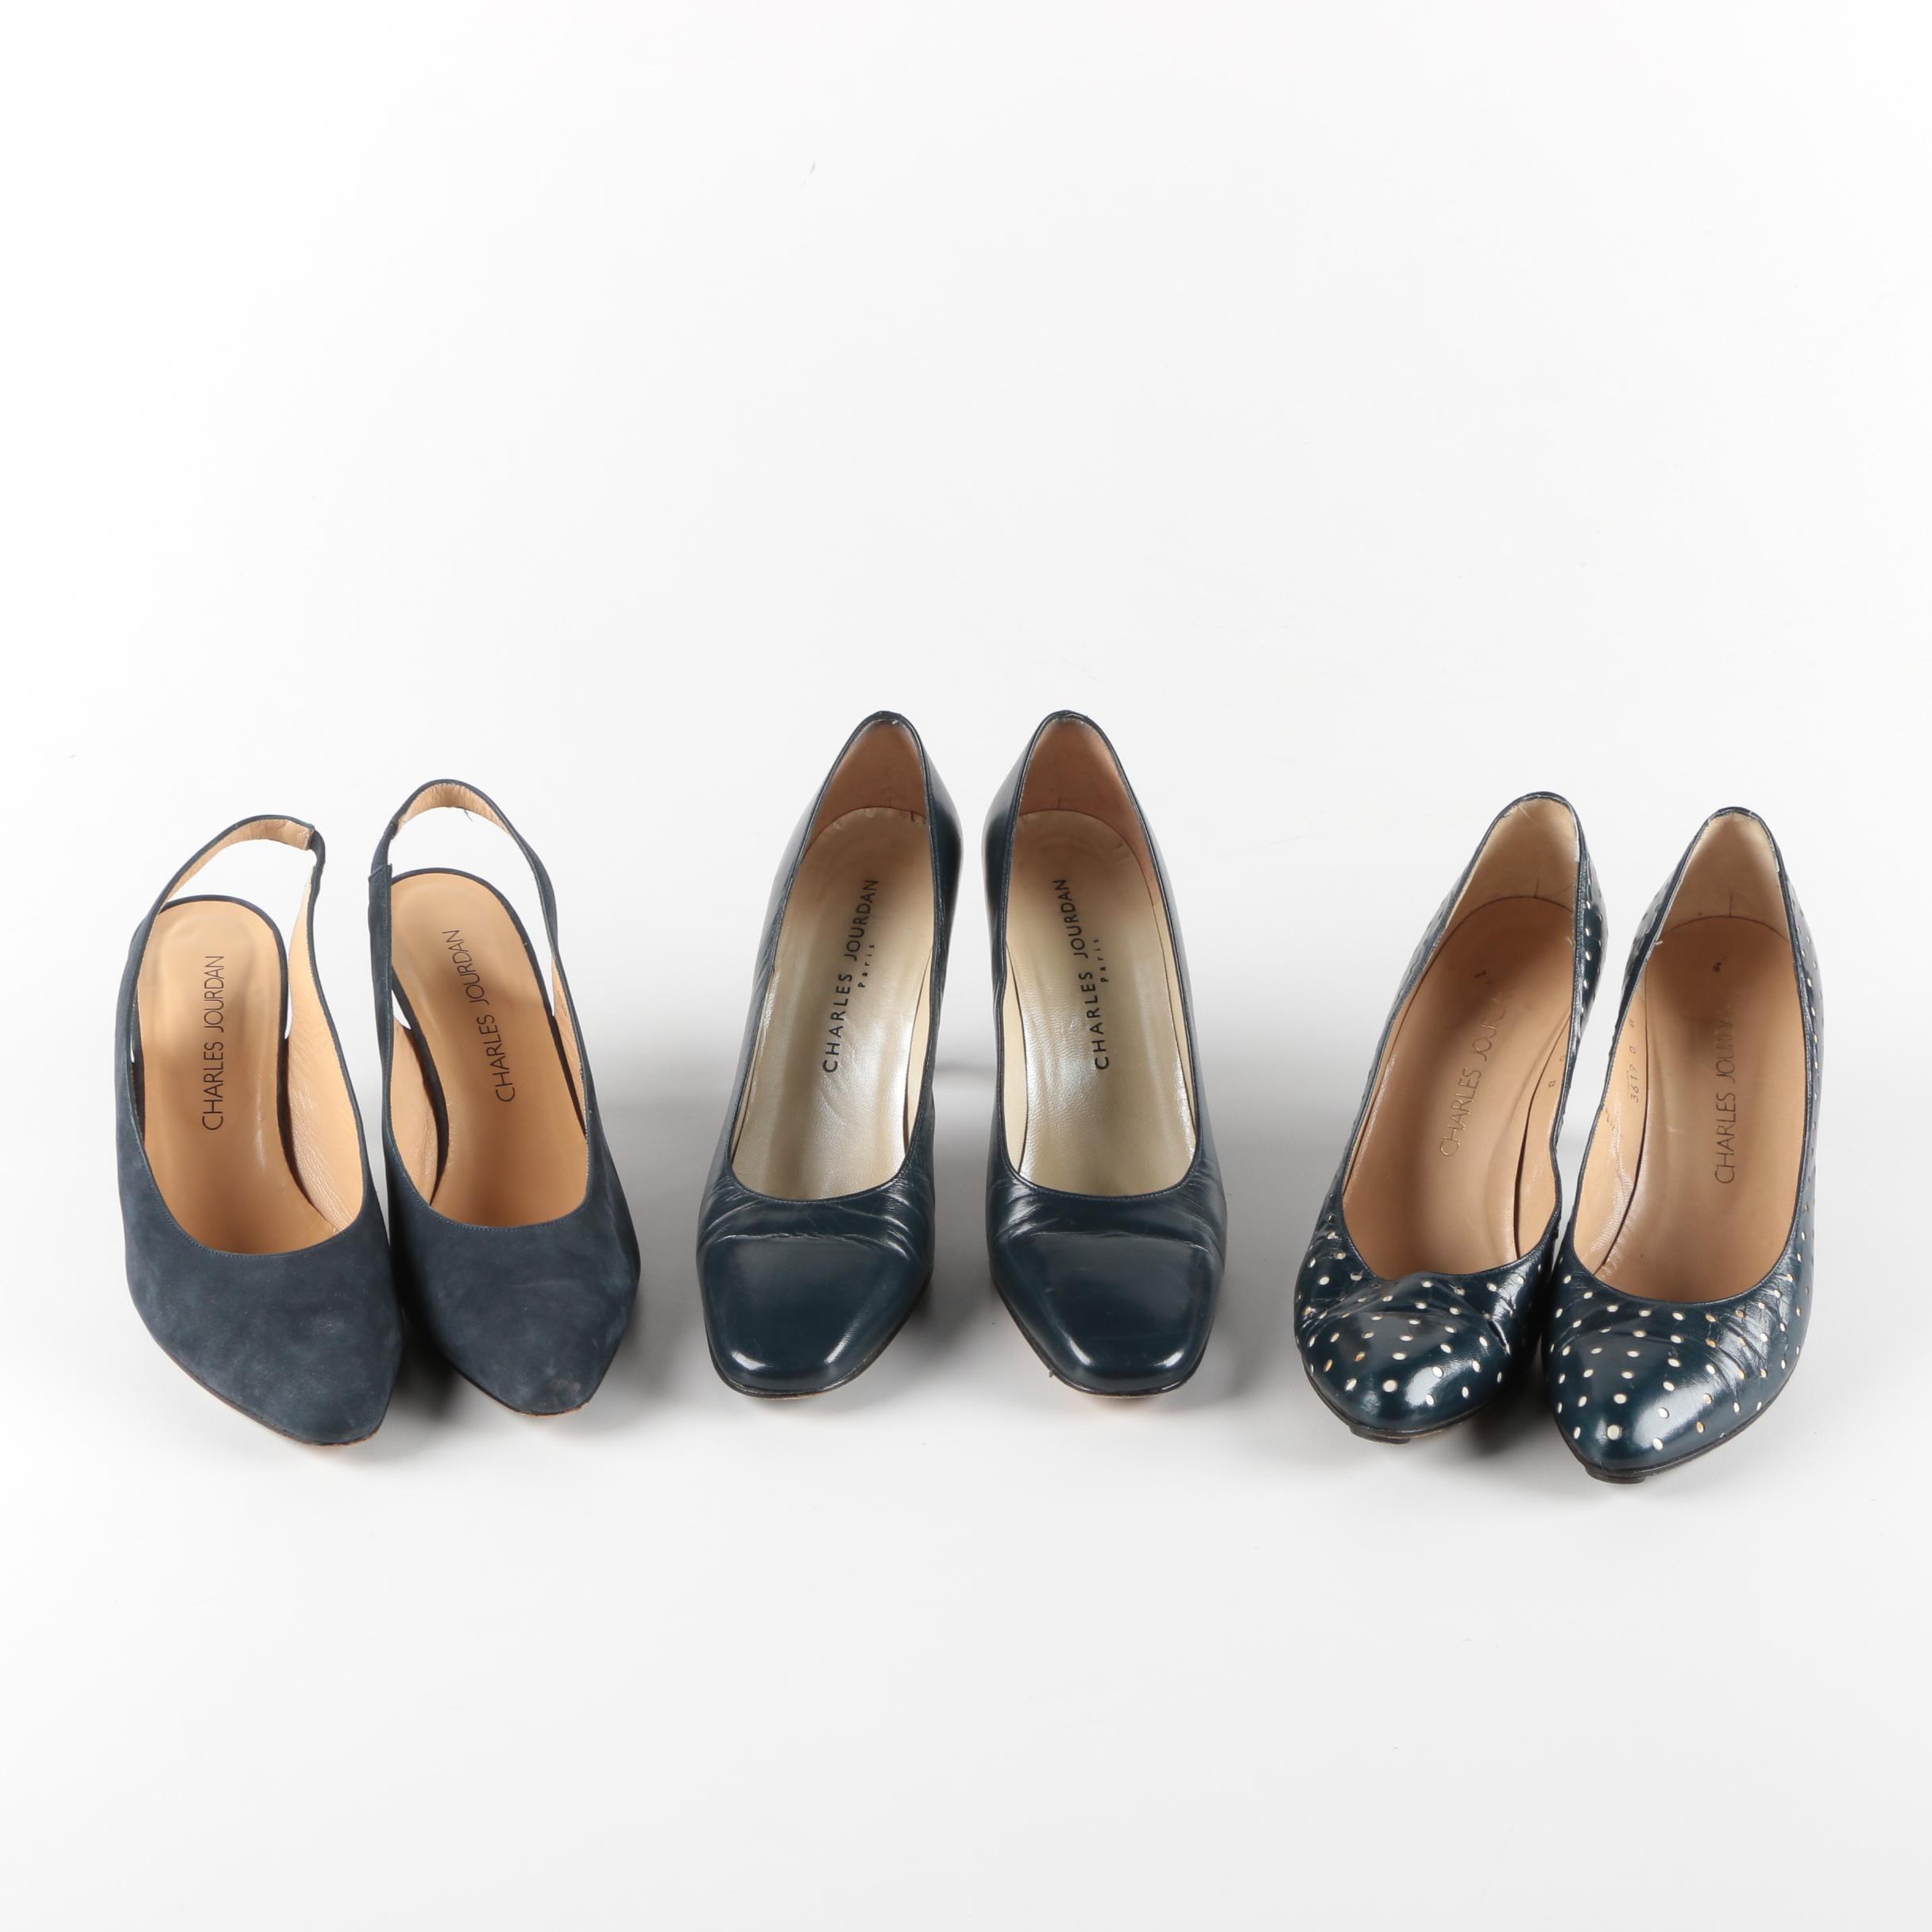 Women's Charles Jourdan Shoes